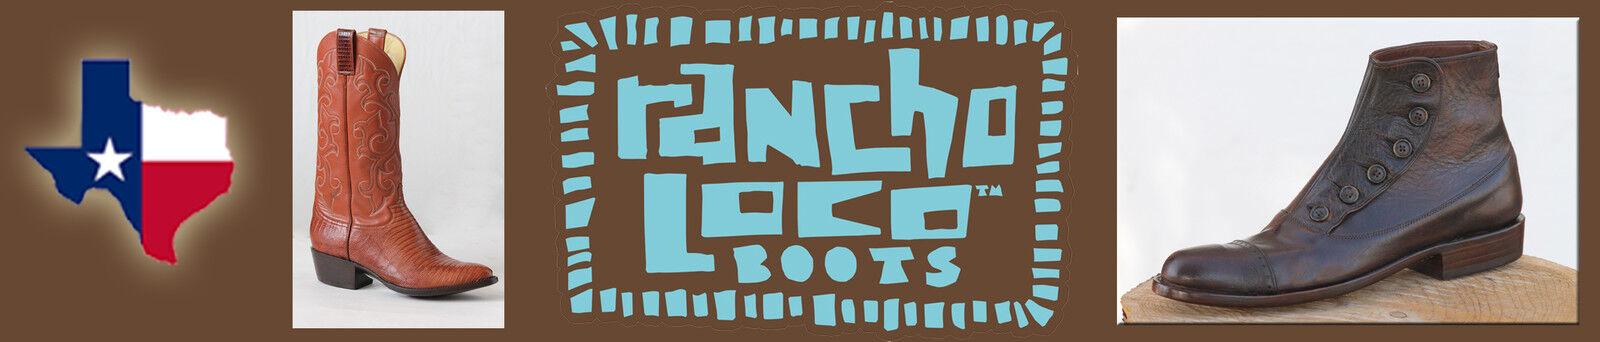 Rancho Loco Boots